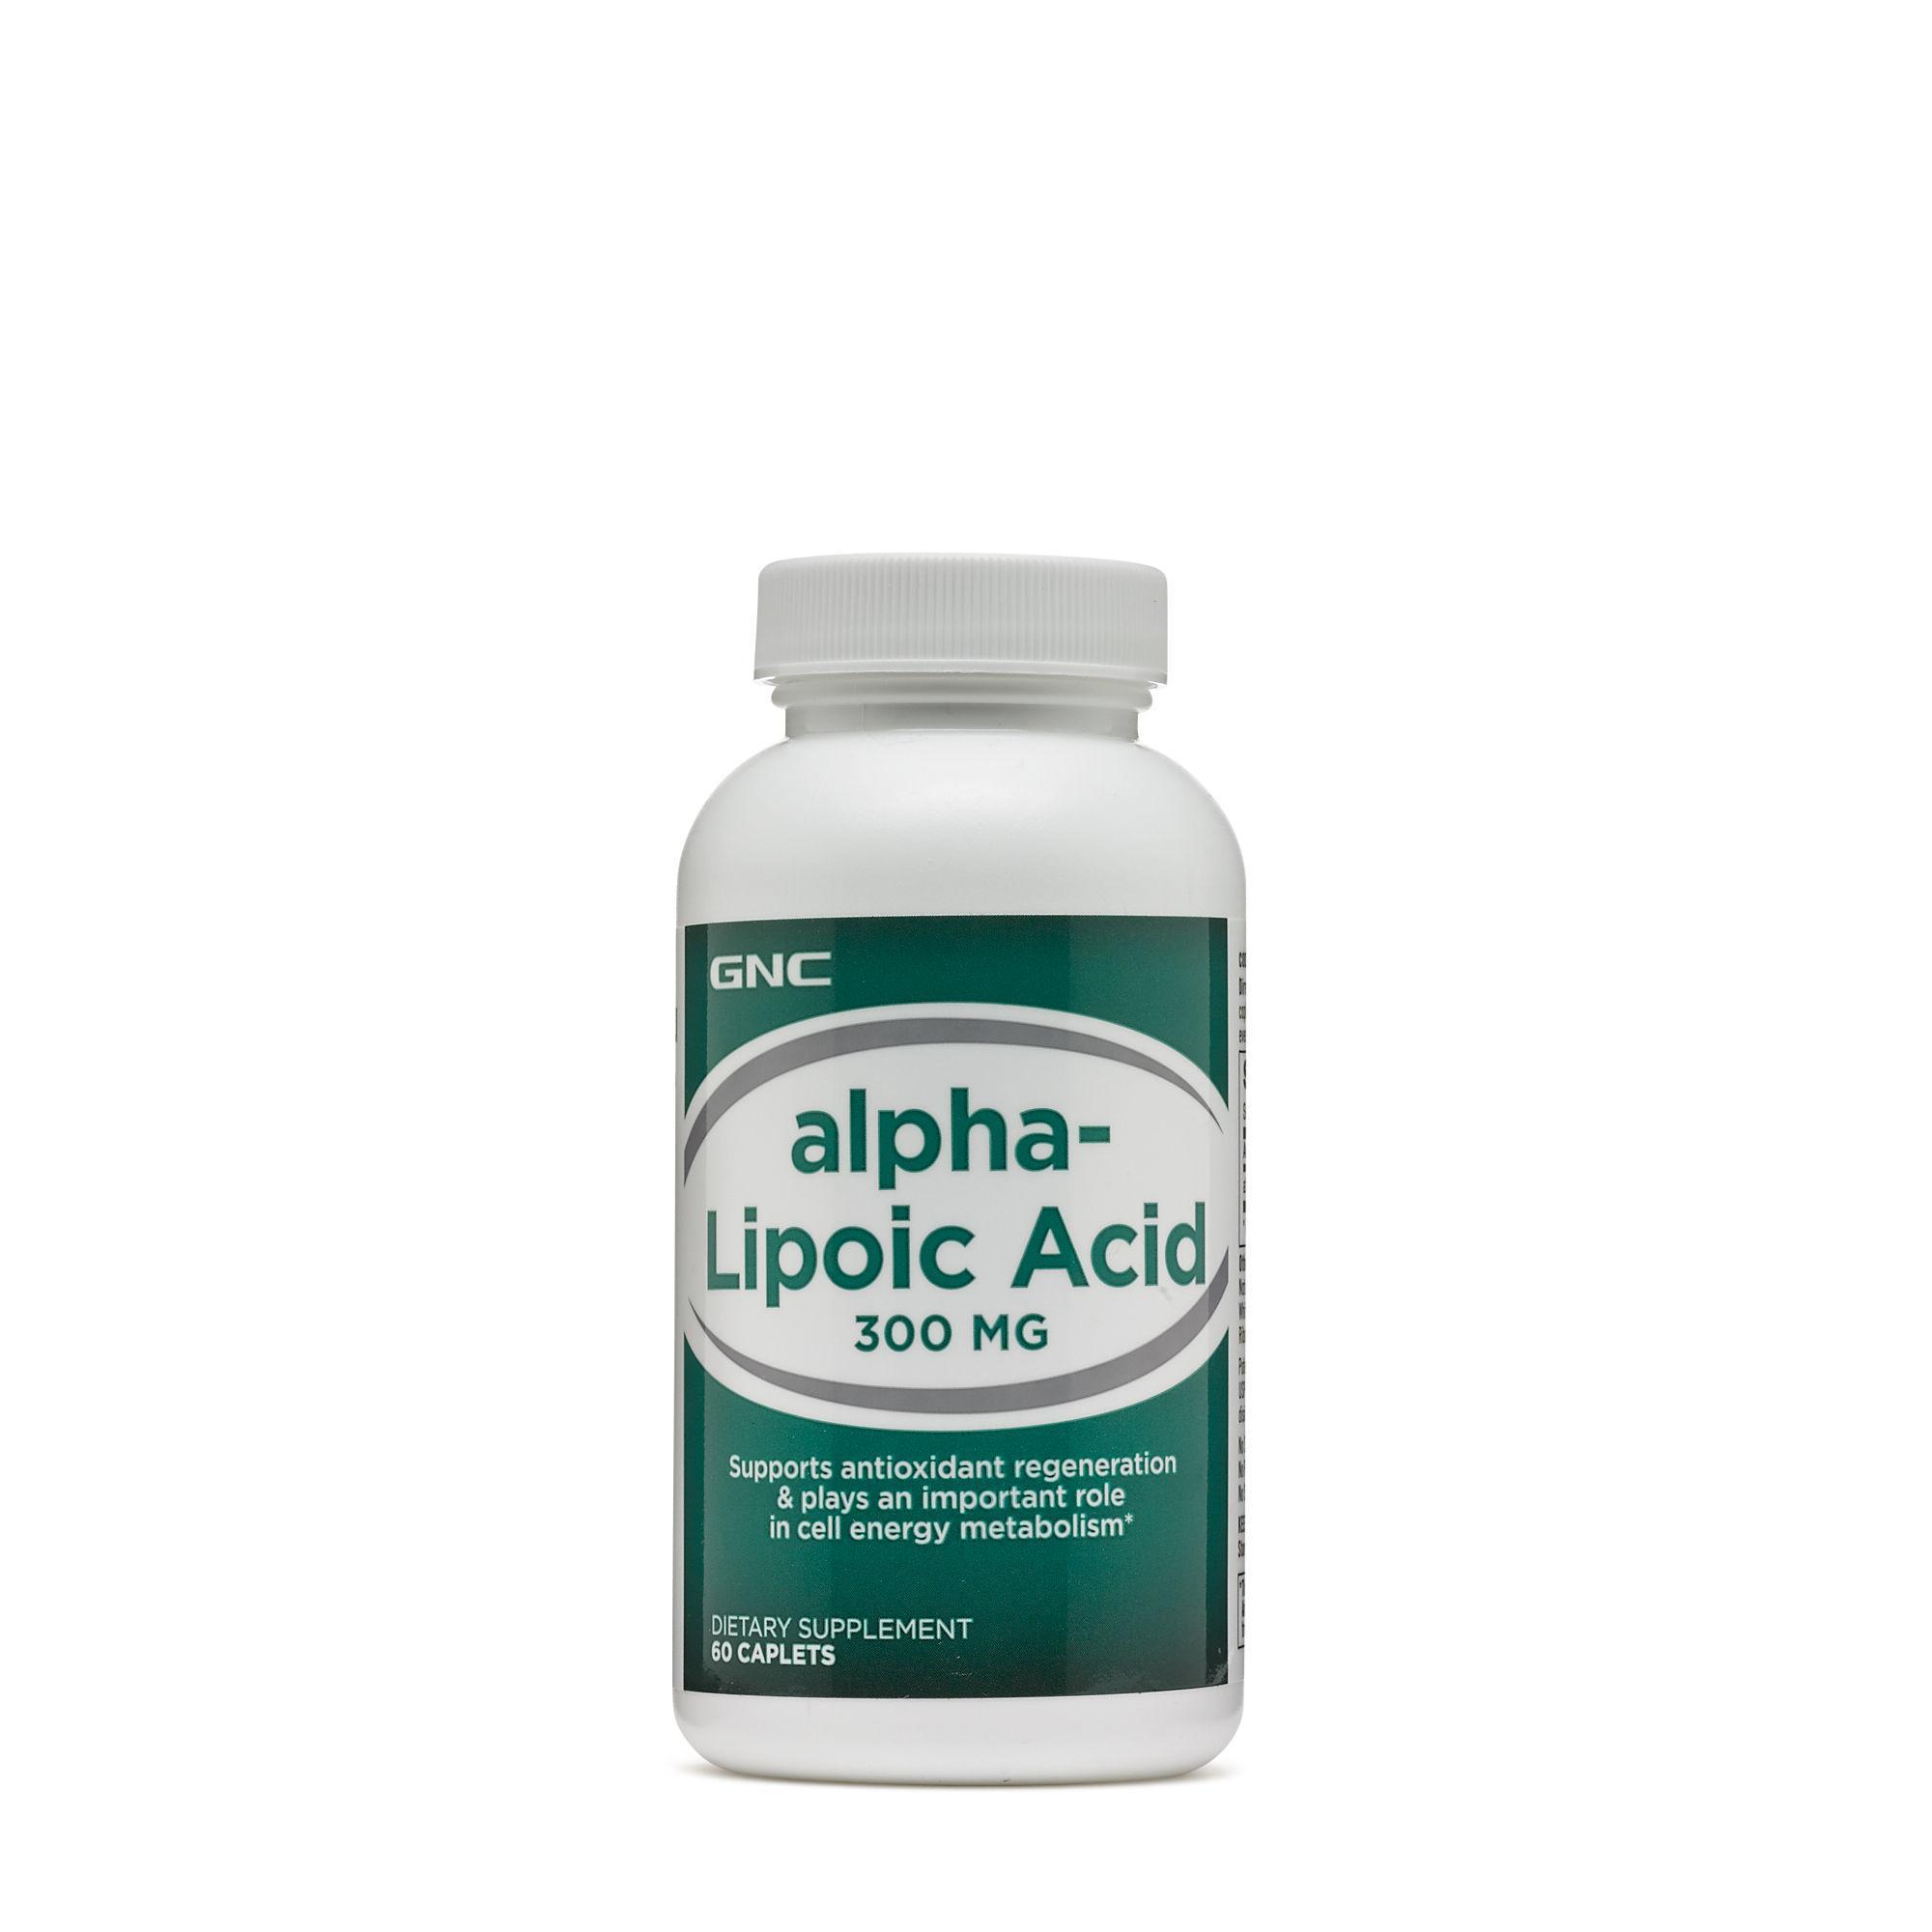 Gnc Alpha Lipoic Acid 300mg 60 Caplets Expiry 2020 By Qq Wellness.